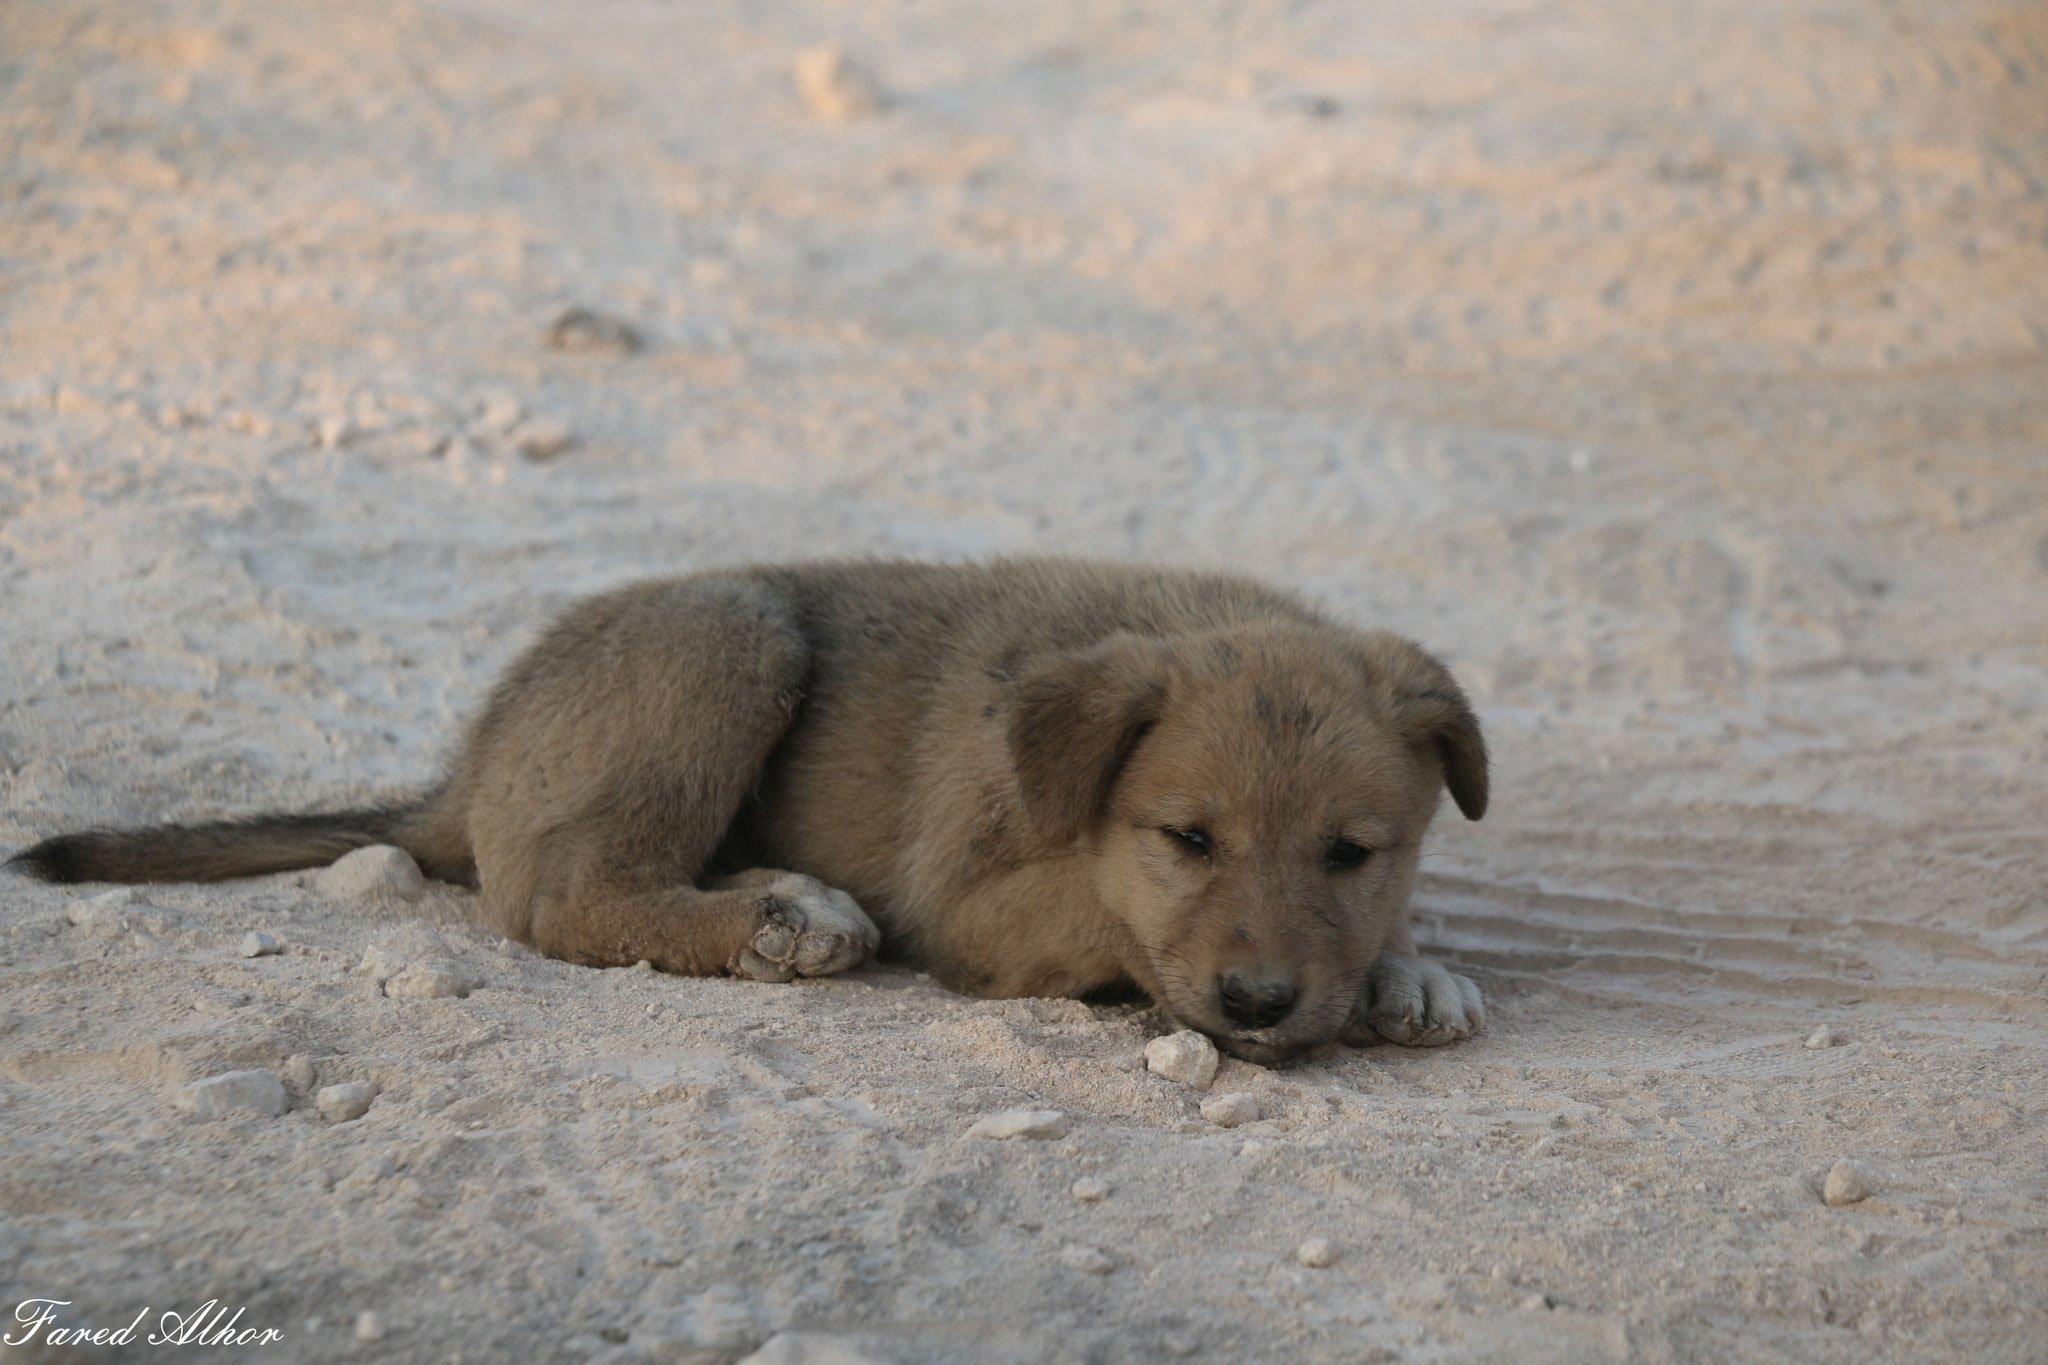 Meet Bobe, the other dog at the Baghdadi raid